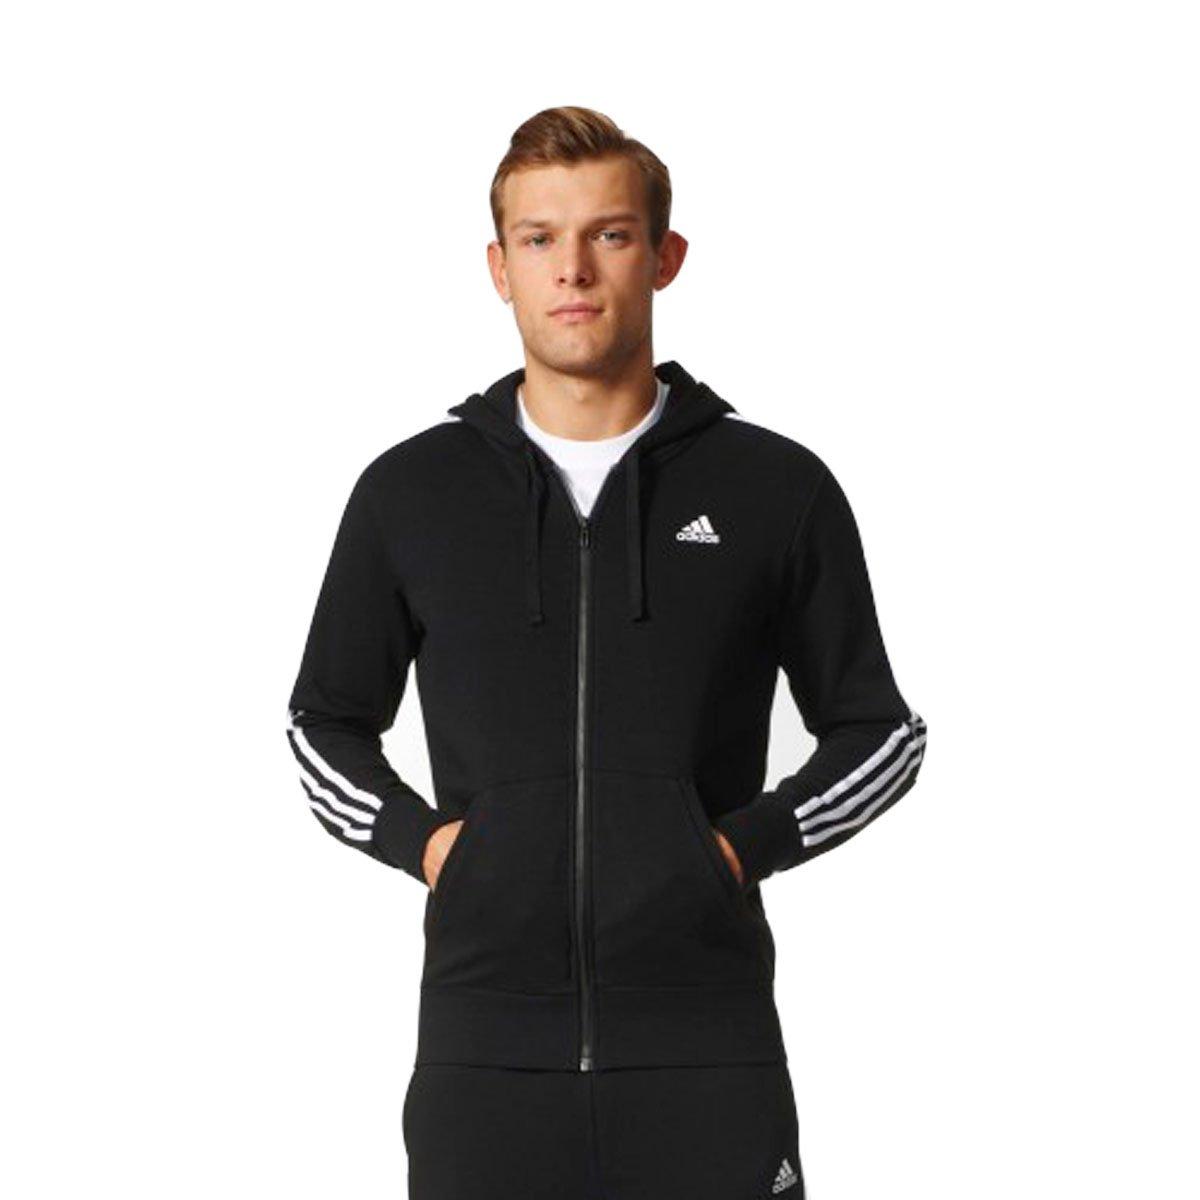 3bf620343ed Bizz Store - Jaqueta Masculina Adidas Essentials 3s FZ Hood Preta